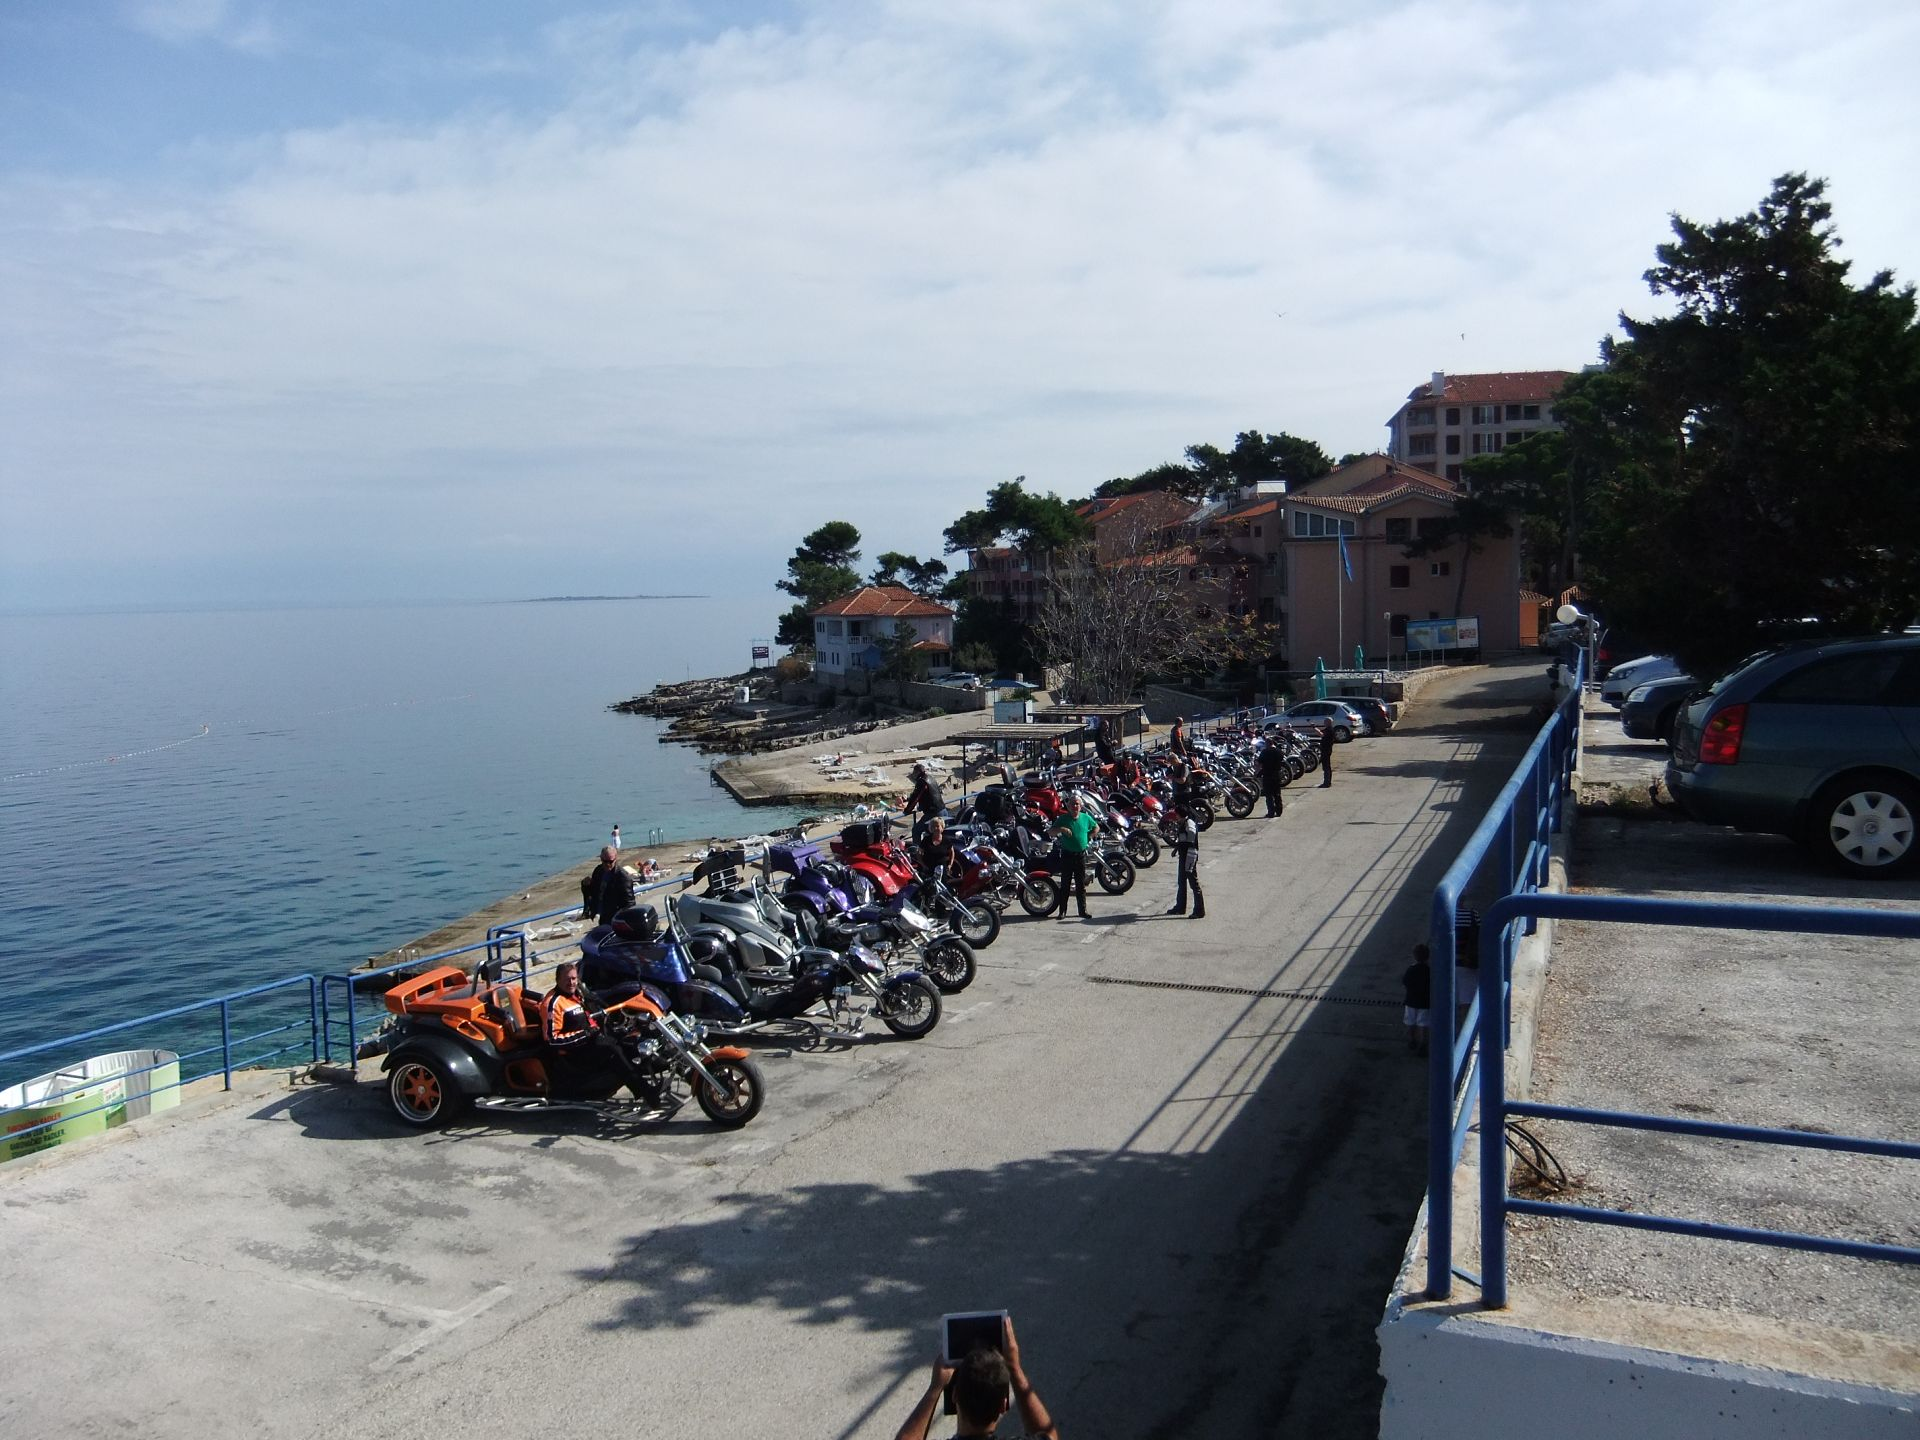 k-Kroatien Sept. Okt. 2012-0940